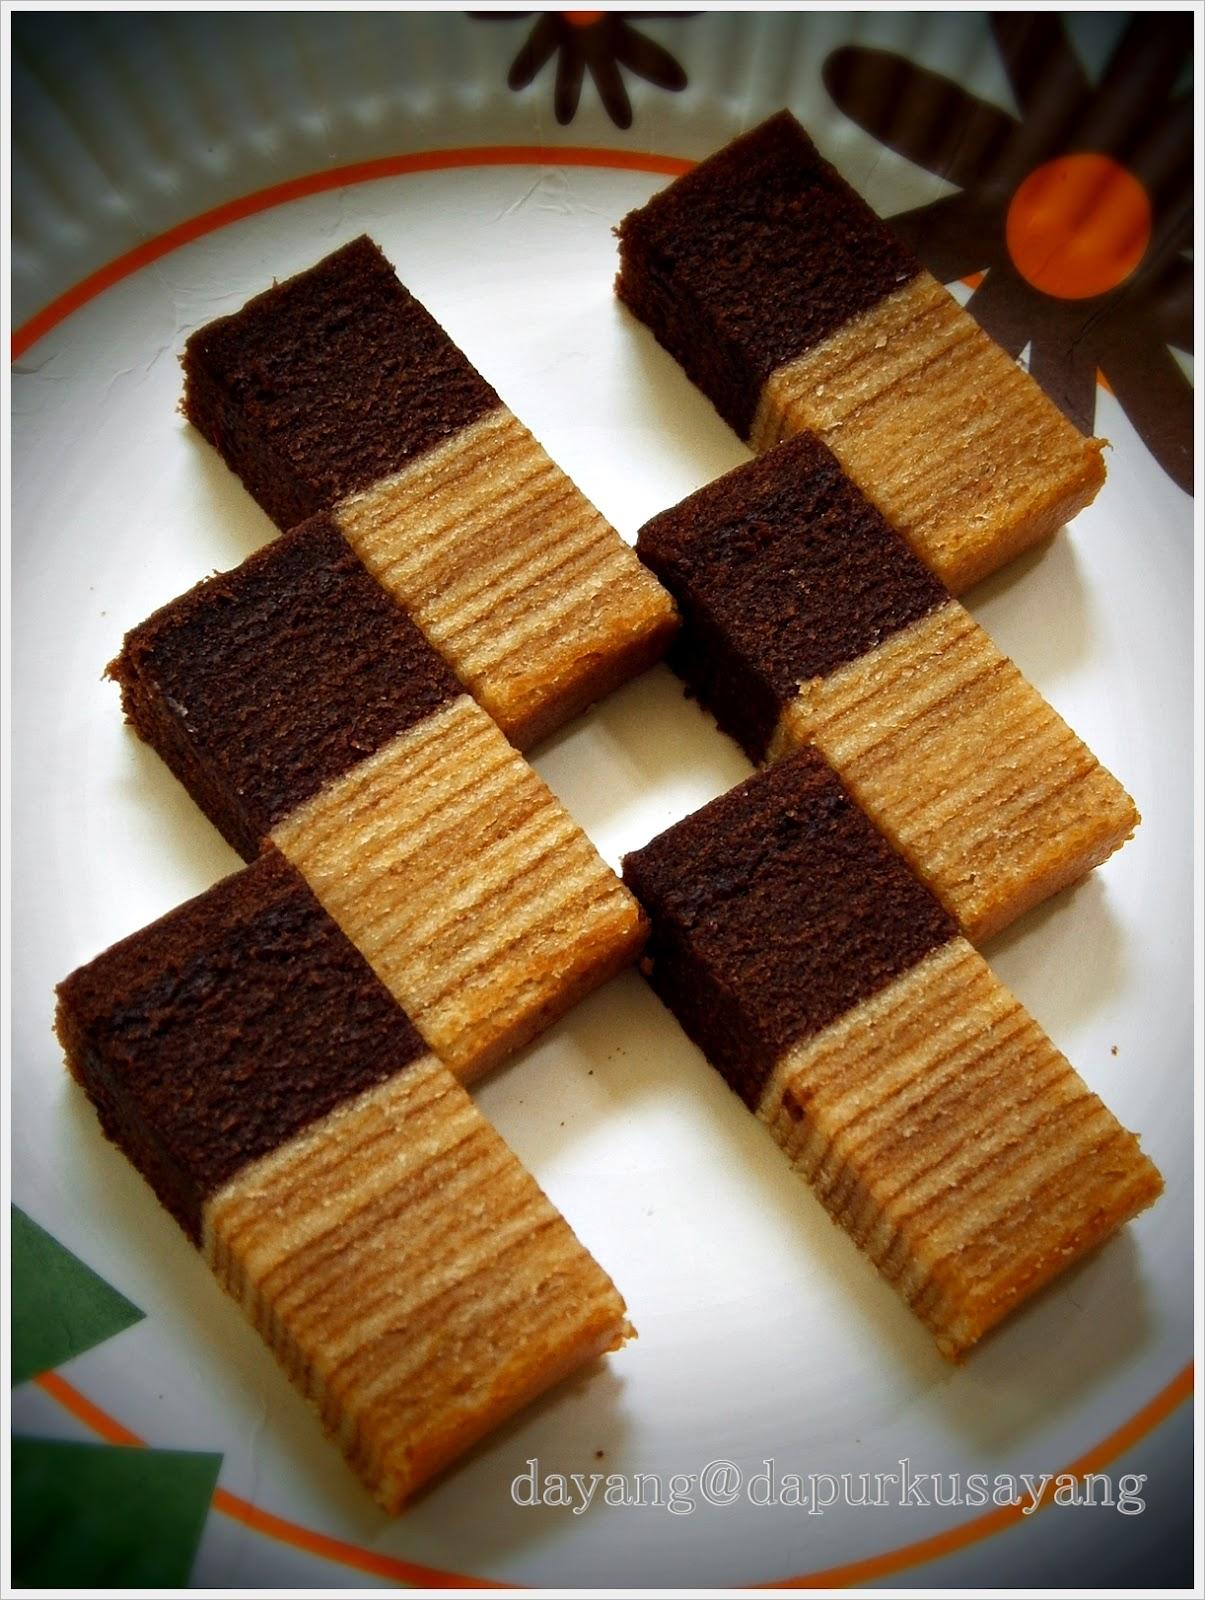 Dapurku Sayang Kek Lapis Keju Coklat